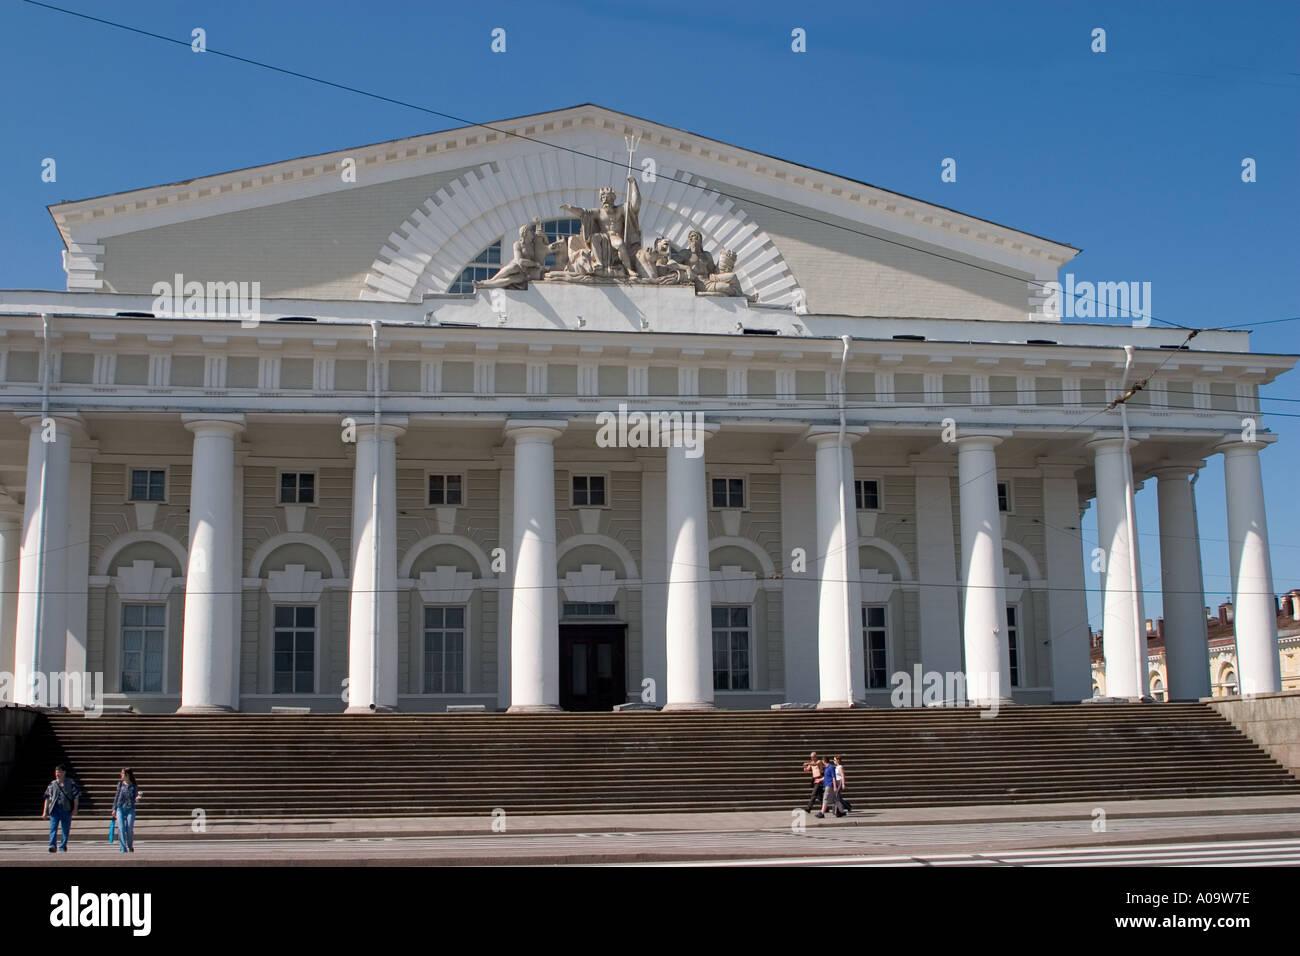 Naval Museum facade St Petersburg Russia Stock Photo